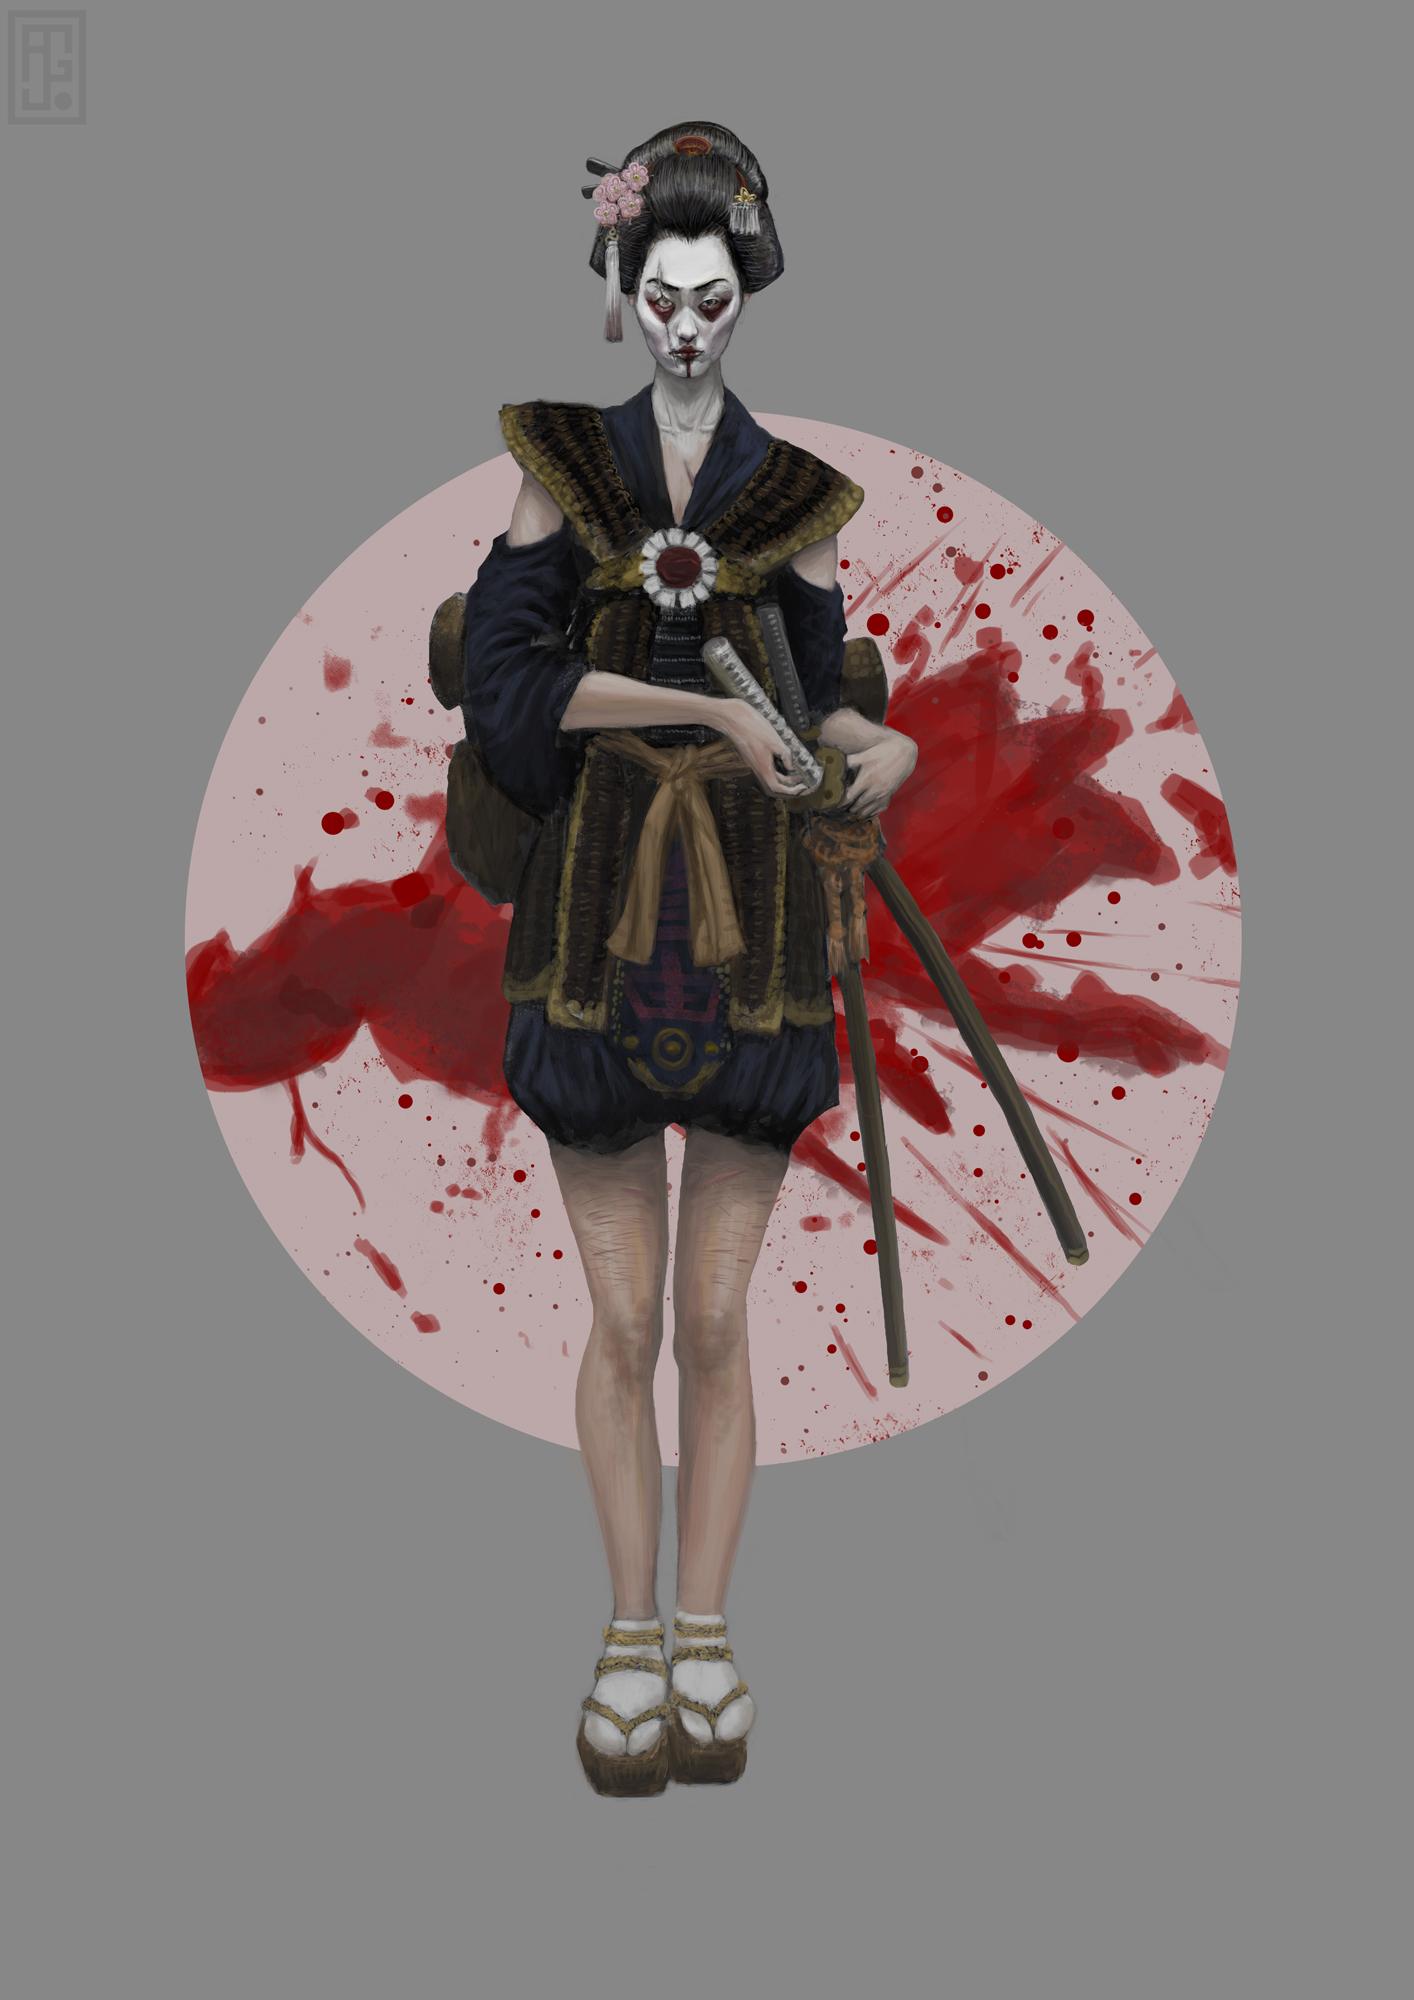 [Image: geisha_turned_samurai_concept_by_xelfereht-d85otrx.jpg]